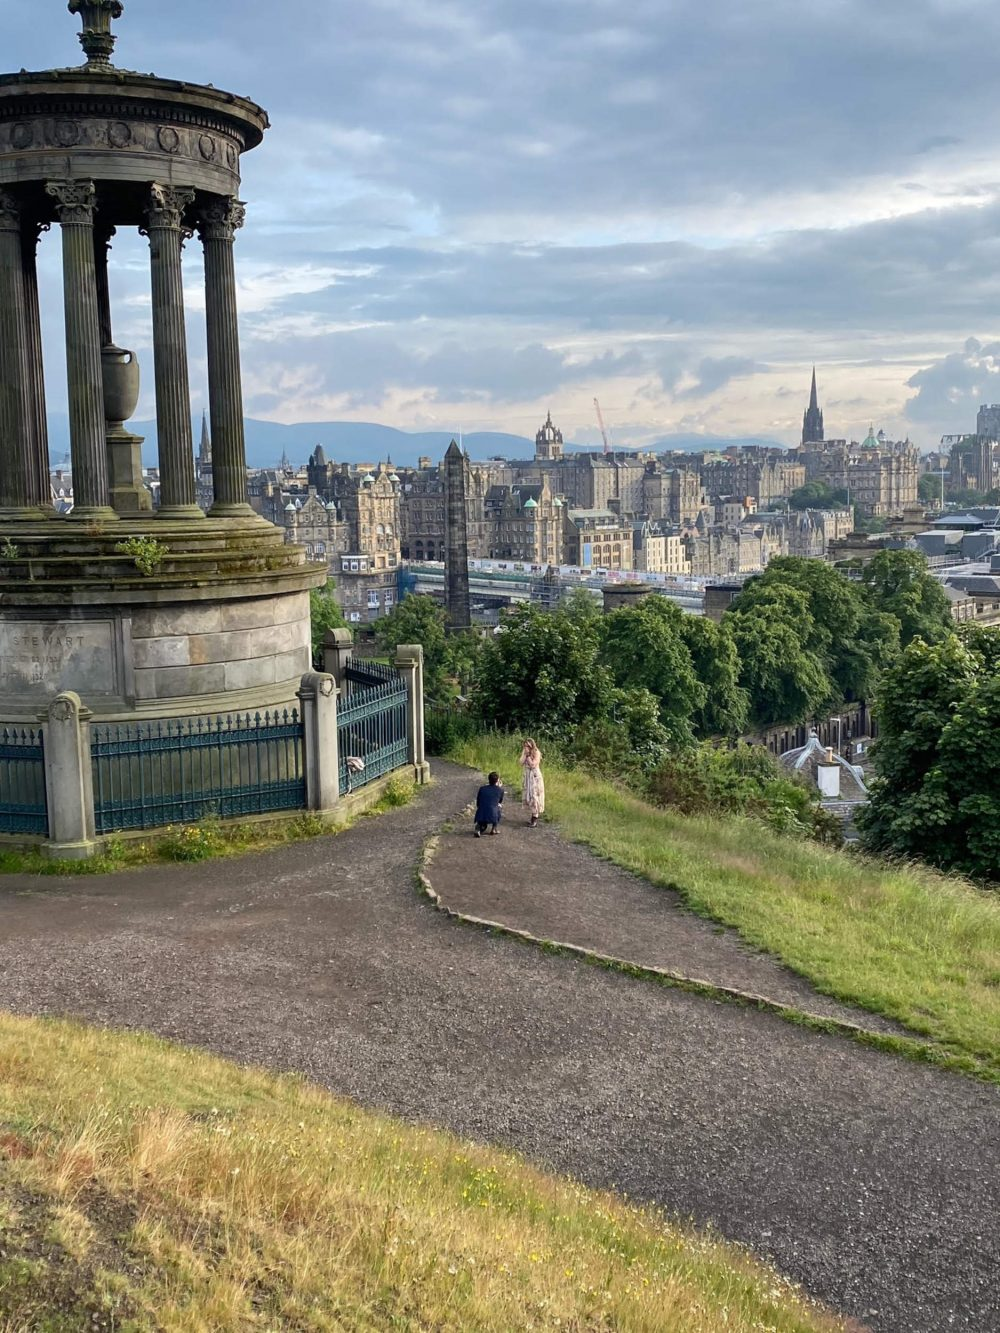 Proposal Calton Hill - Edinburgh News